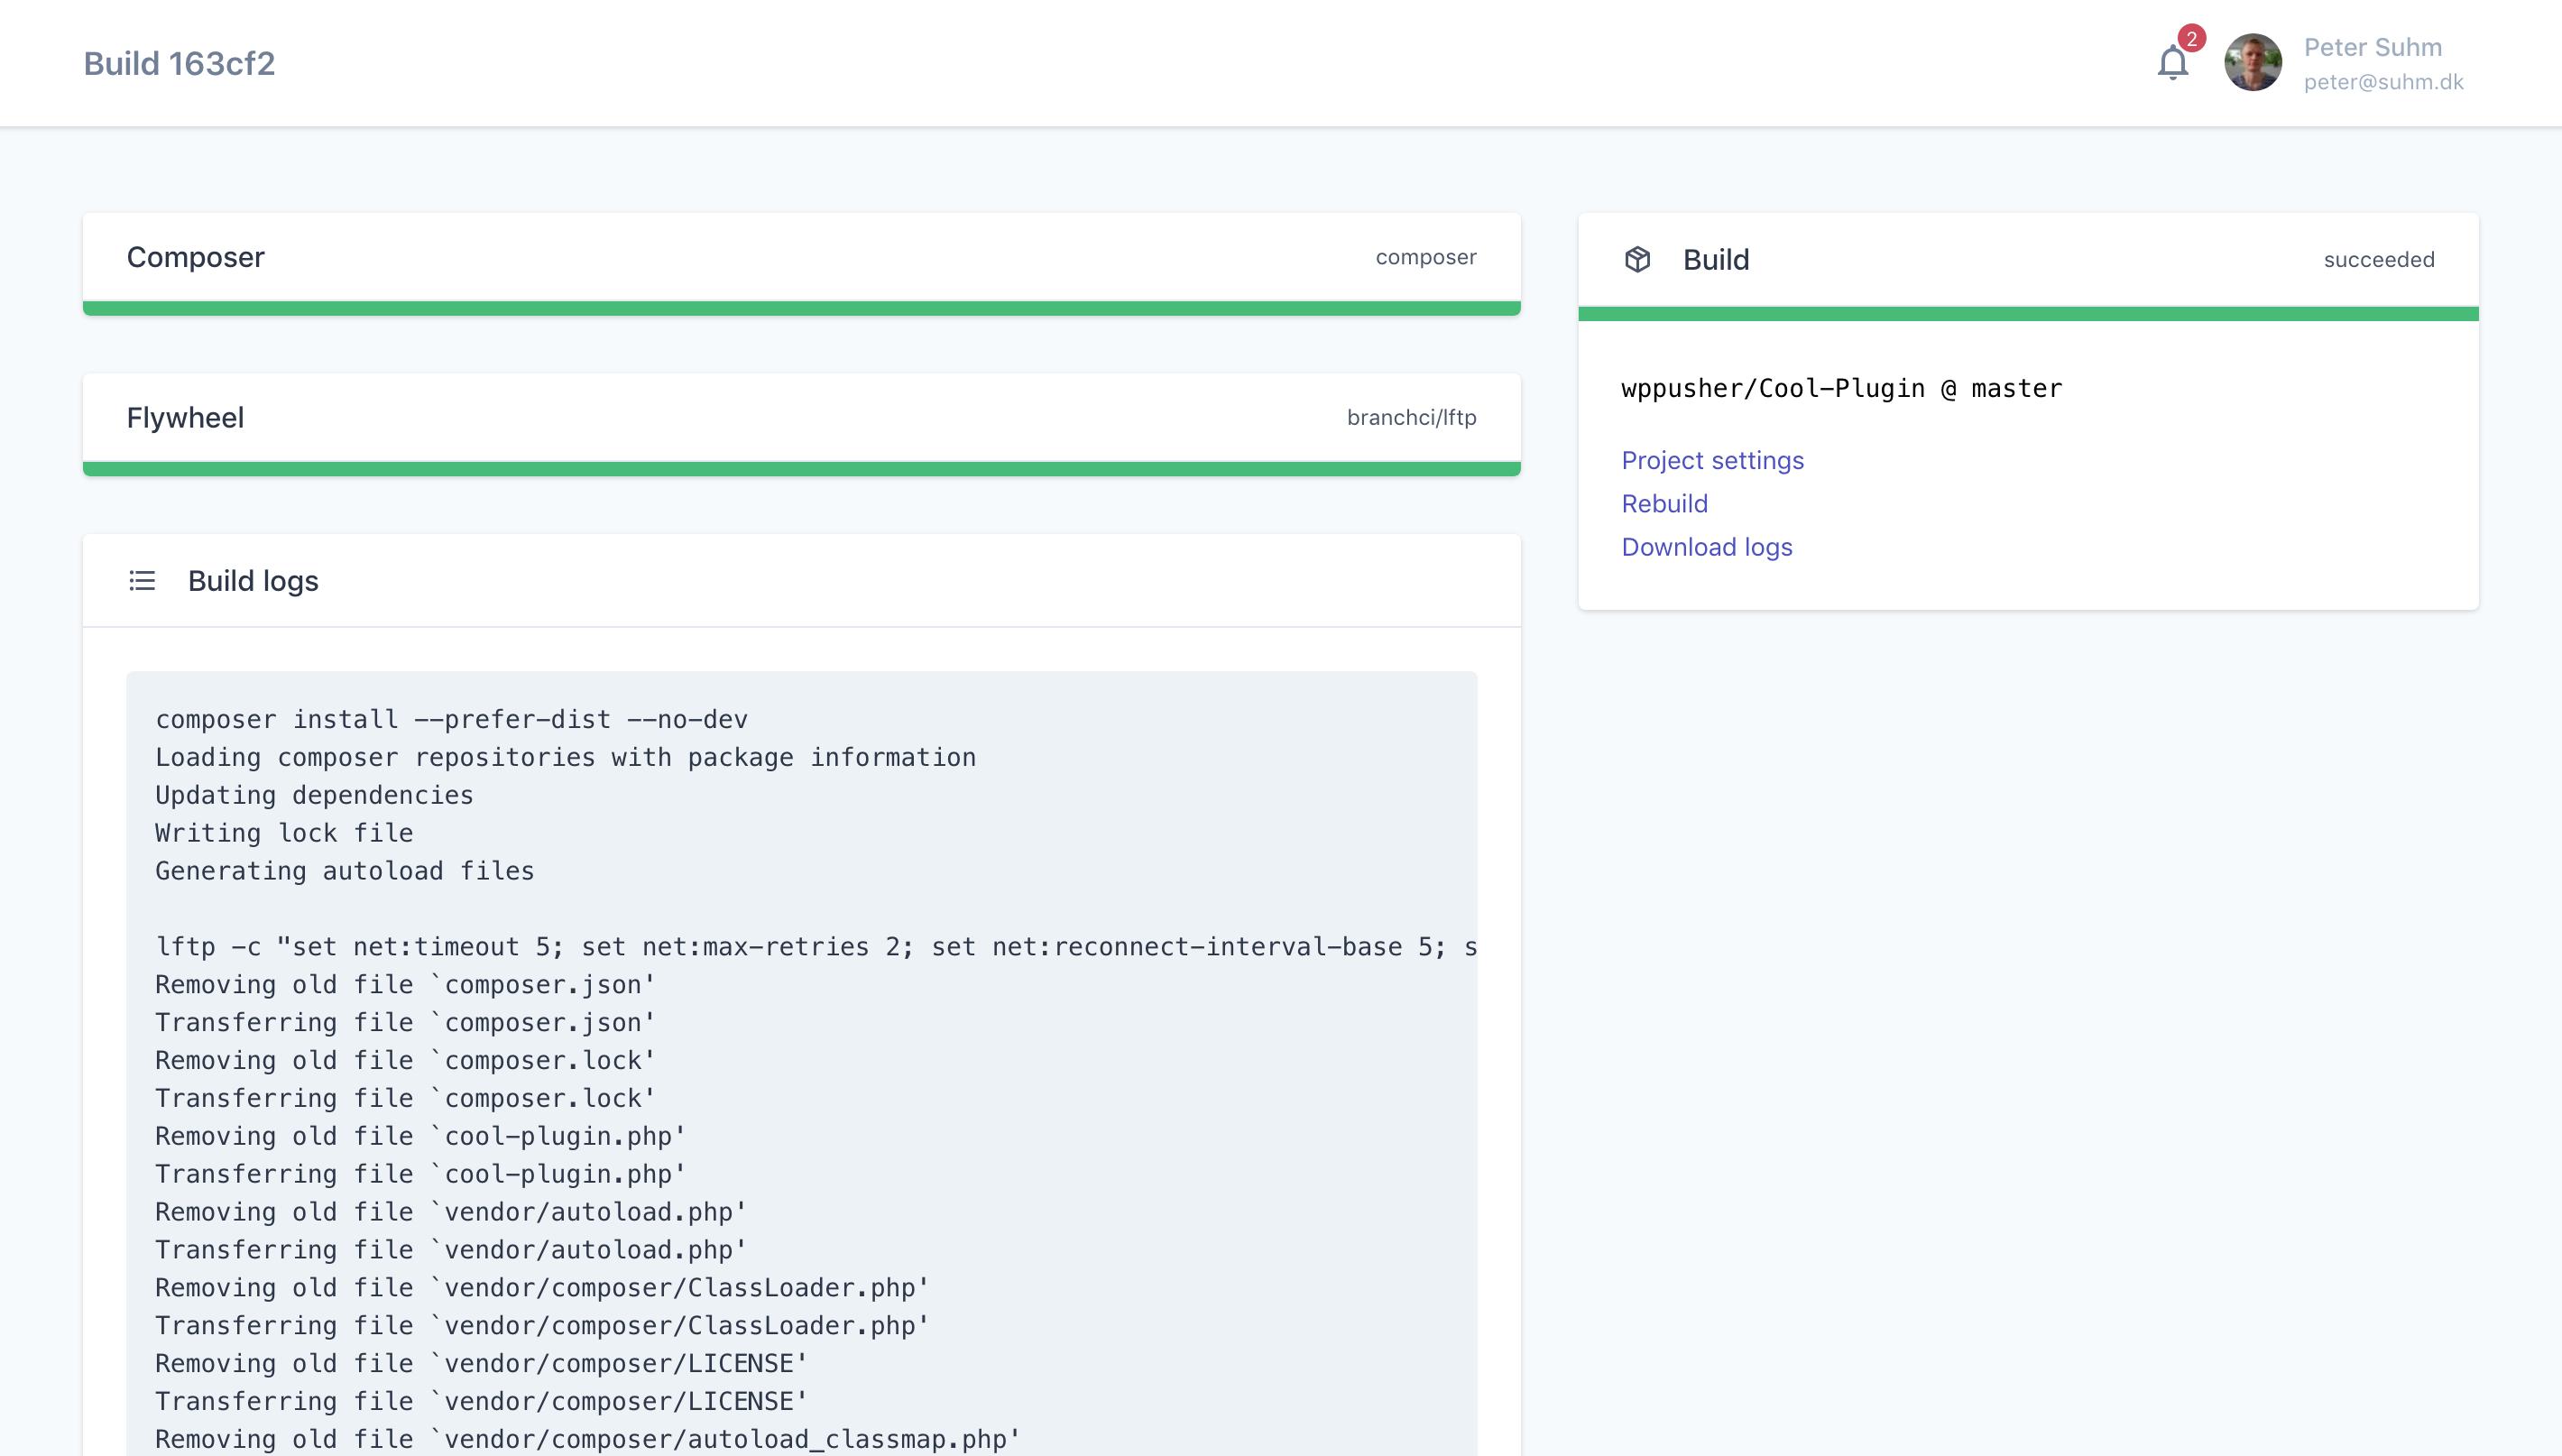 https://res.cloudinary.com/ddmezyu9v/image/upload/v1581586219/Documentation/SiteGround/siteground-plugin-build-result_ikaqus.png